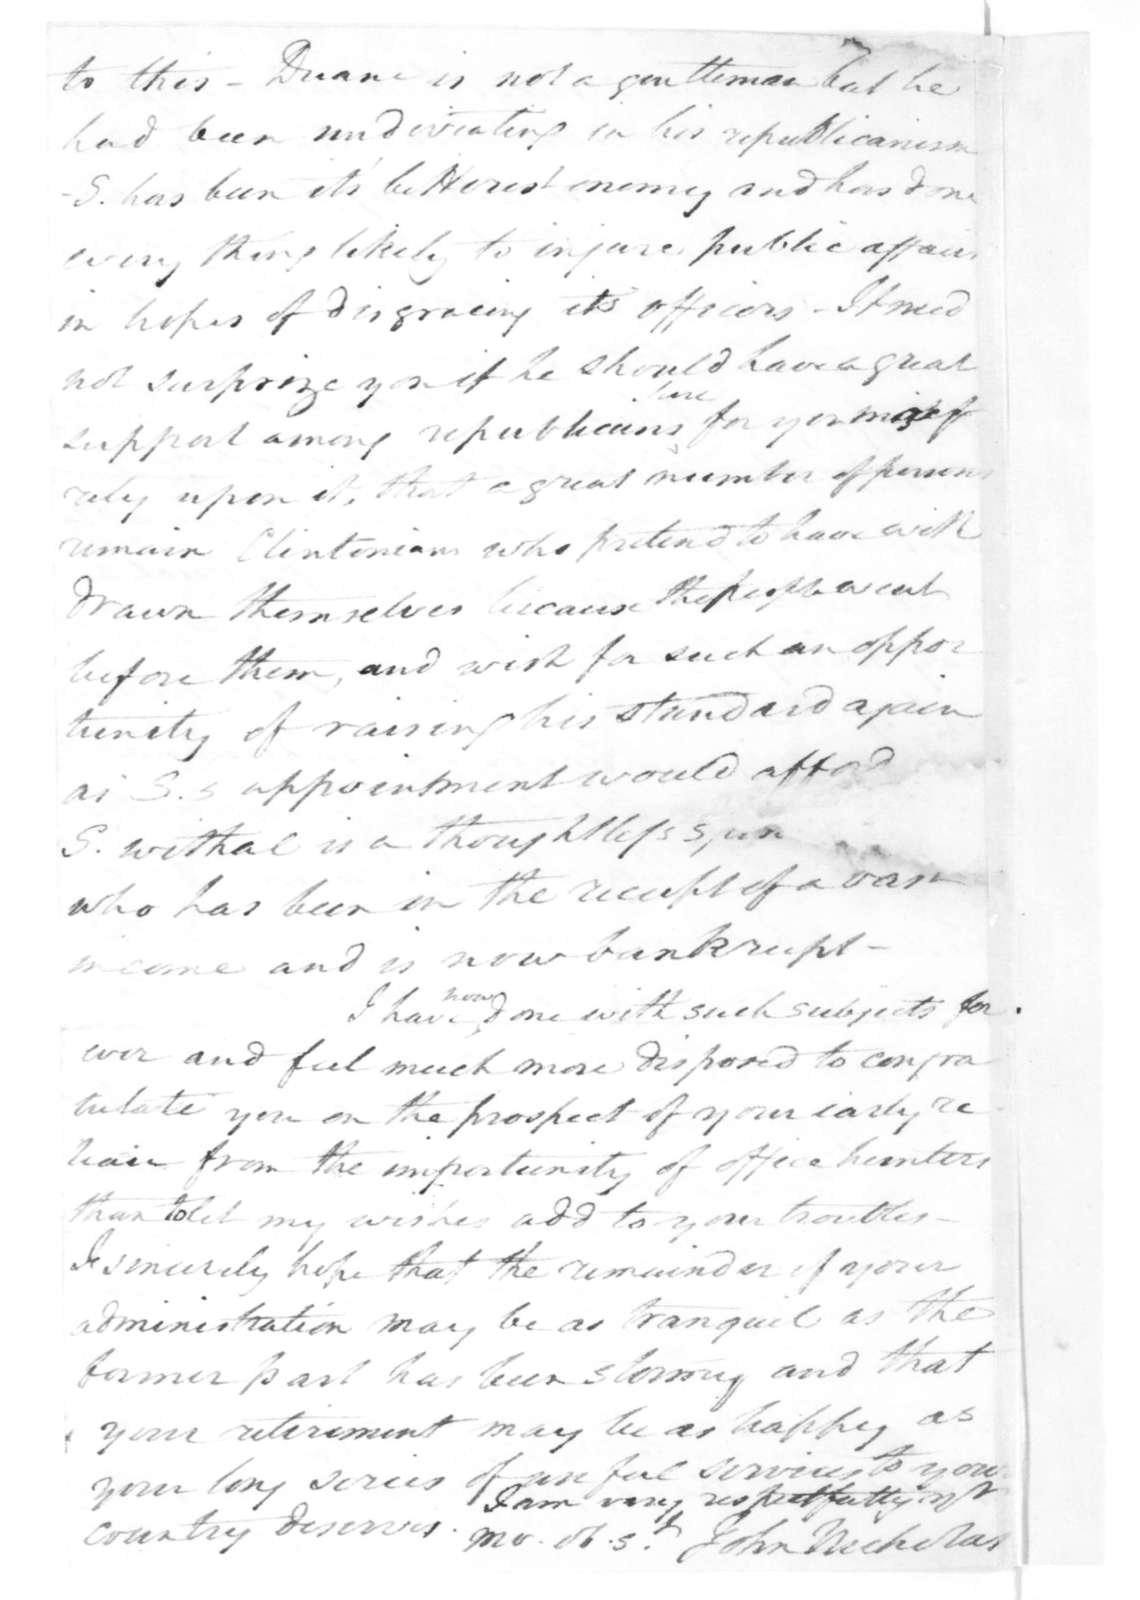 John Nicholas to James Madison, February 28, 1816.